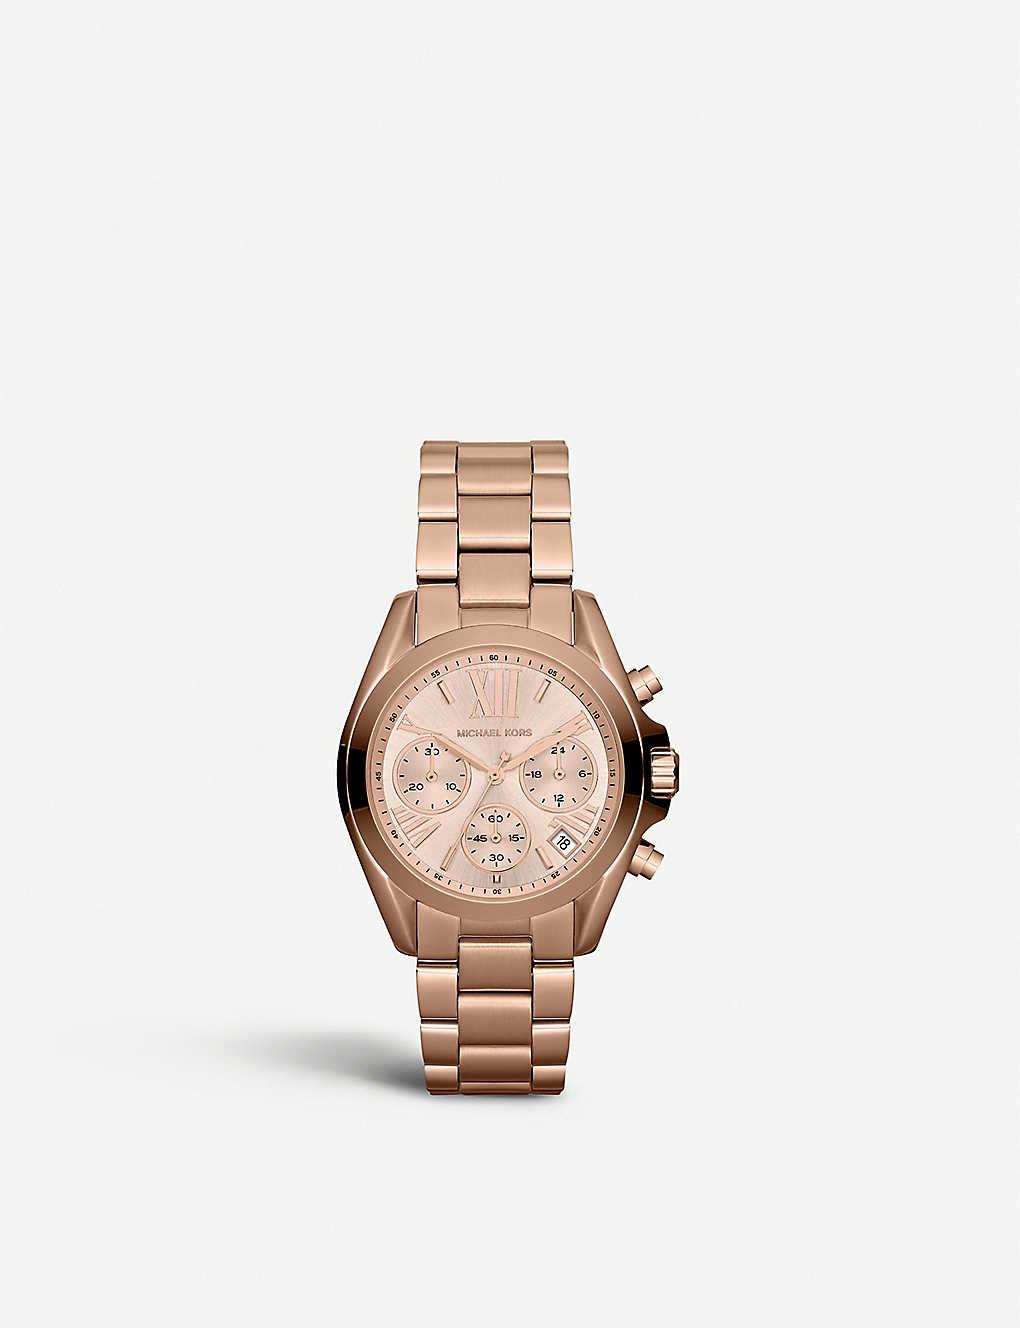 3ebdfd22a89c MICHAEL KORS - MK5799 Mini Bradshaw rose gold-plated watch ...